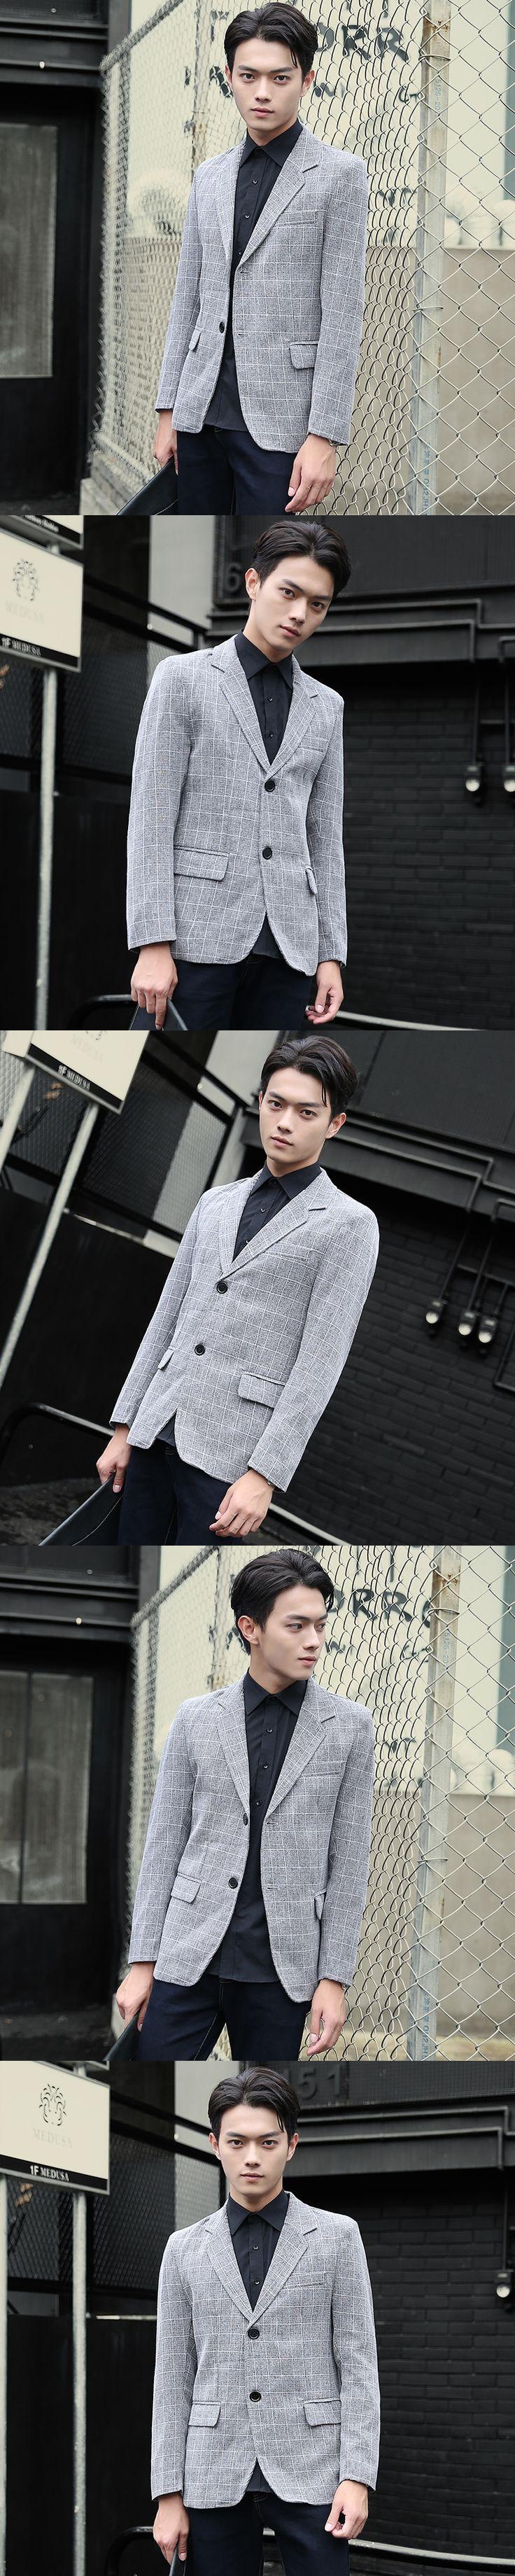 2017 Fall Men's fashion movement Casual Suit Korean Slim Plaid Small Singles West Teens Jacket Tide Sweatshirt Free shipping